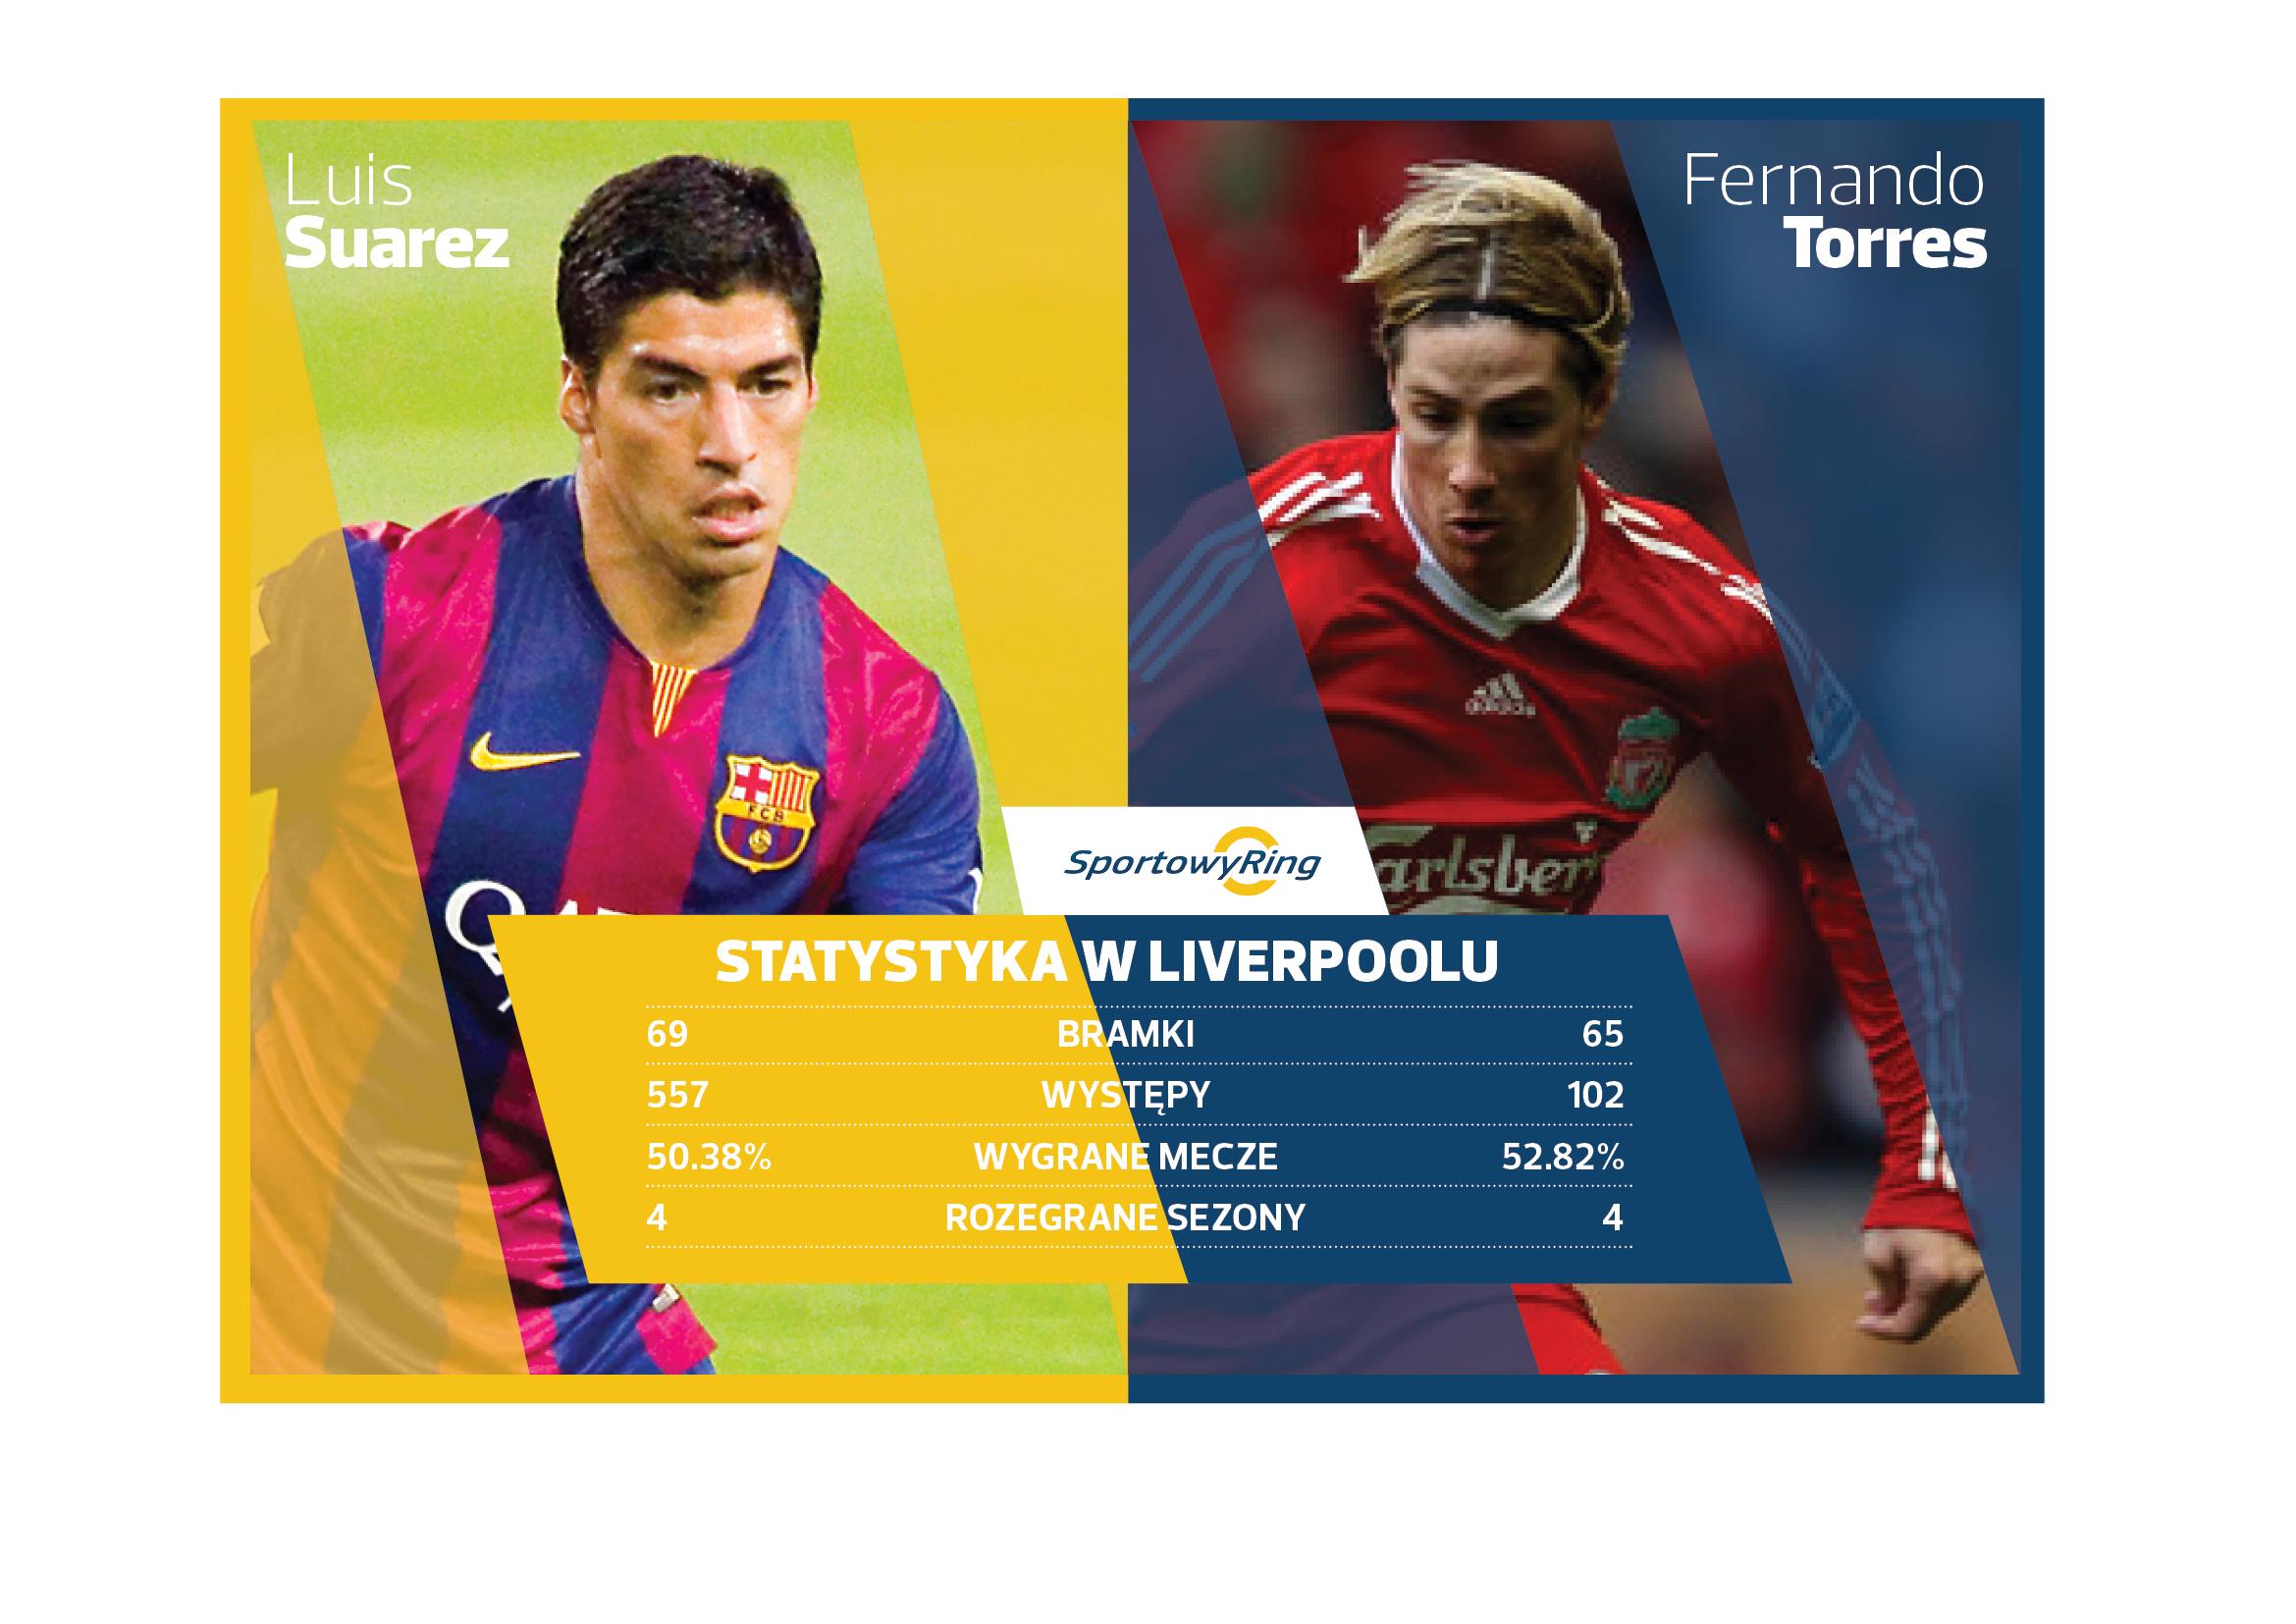 luis-suarez-liverpool-vs-luis-suarez-barcelona-sportowyring-com